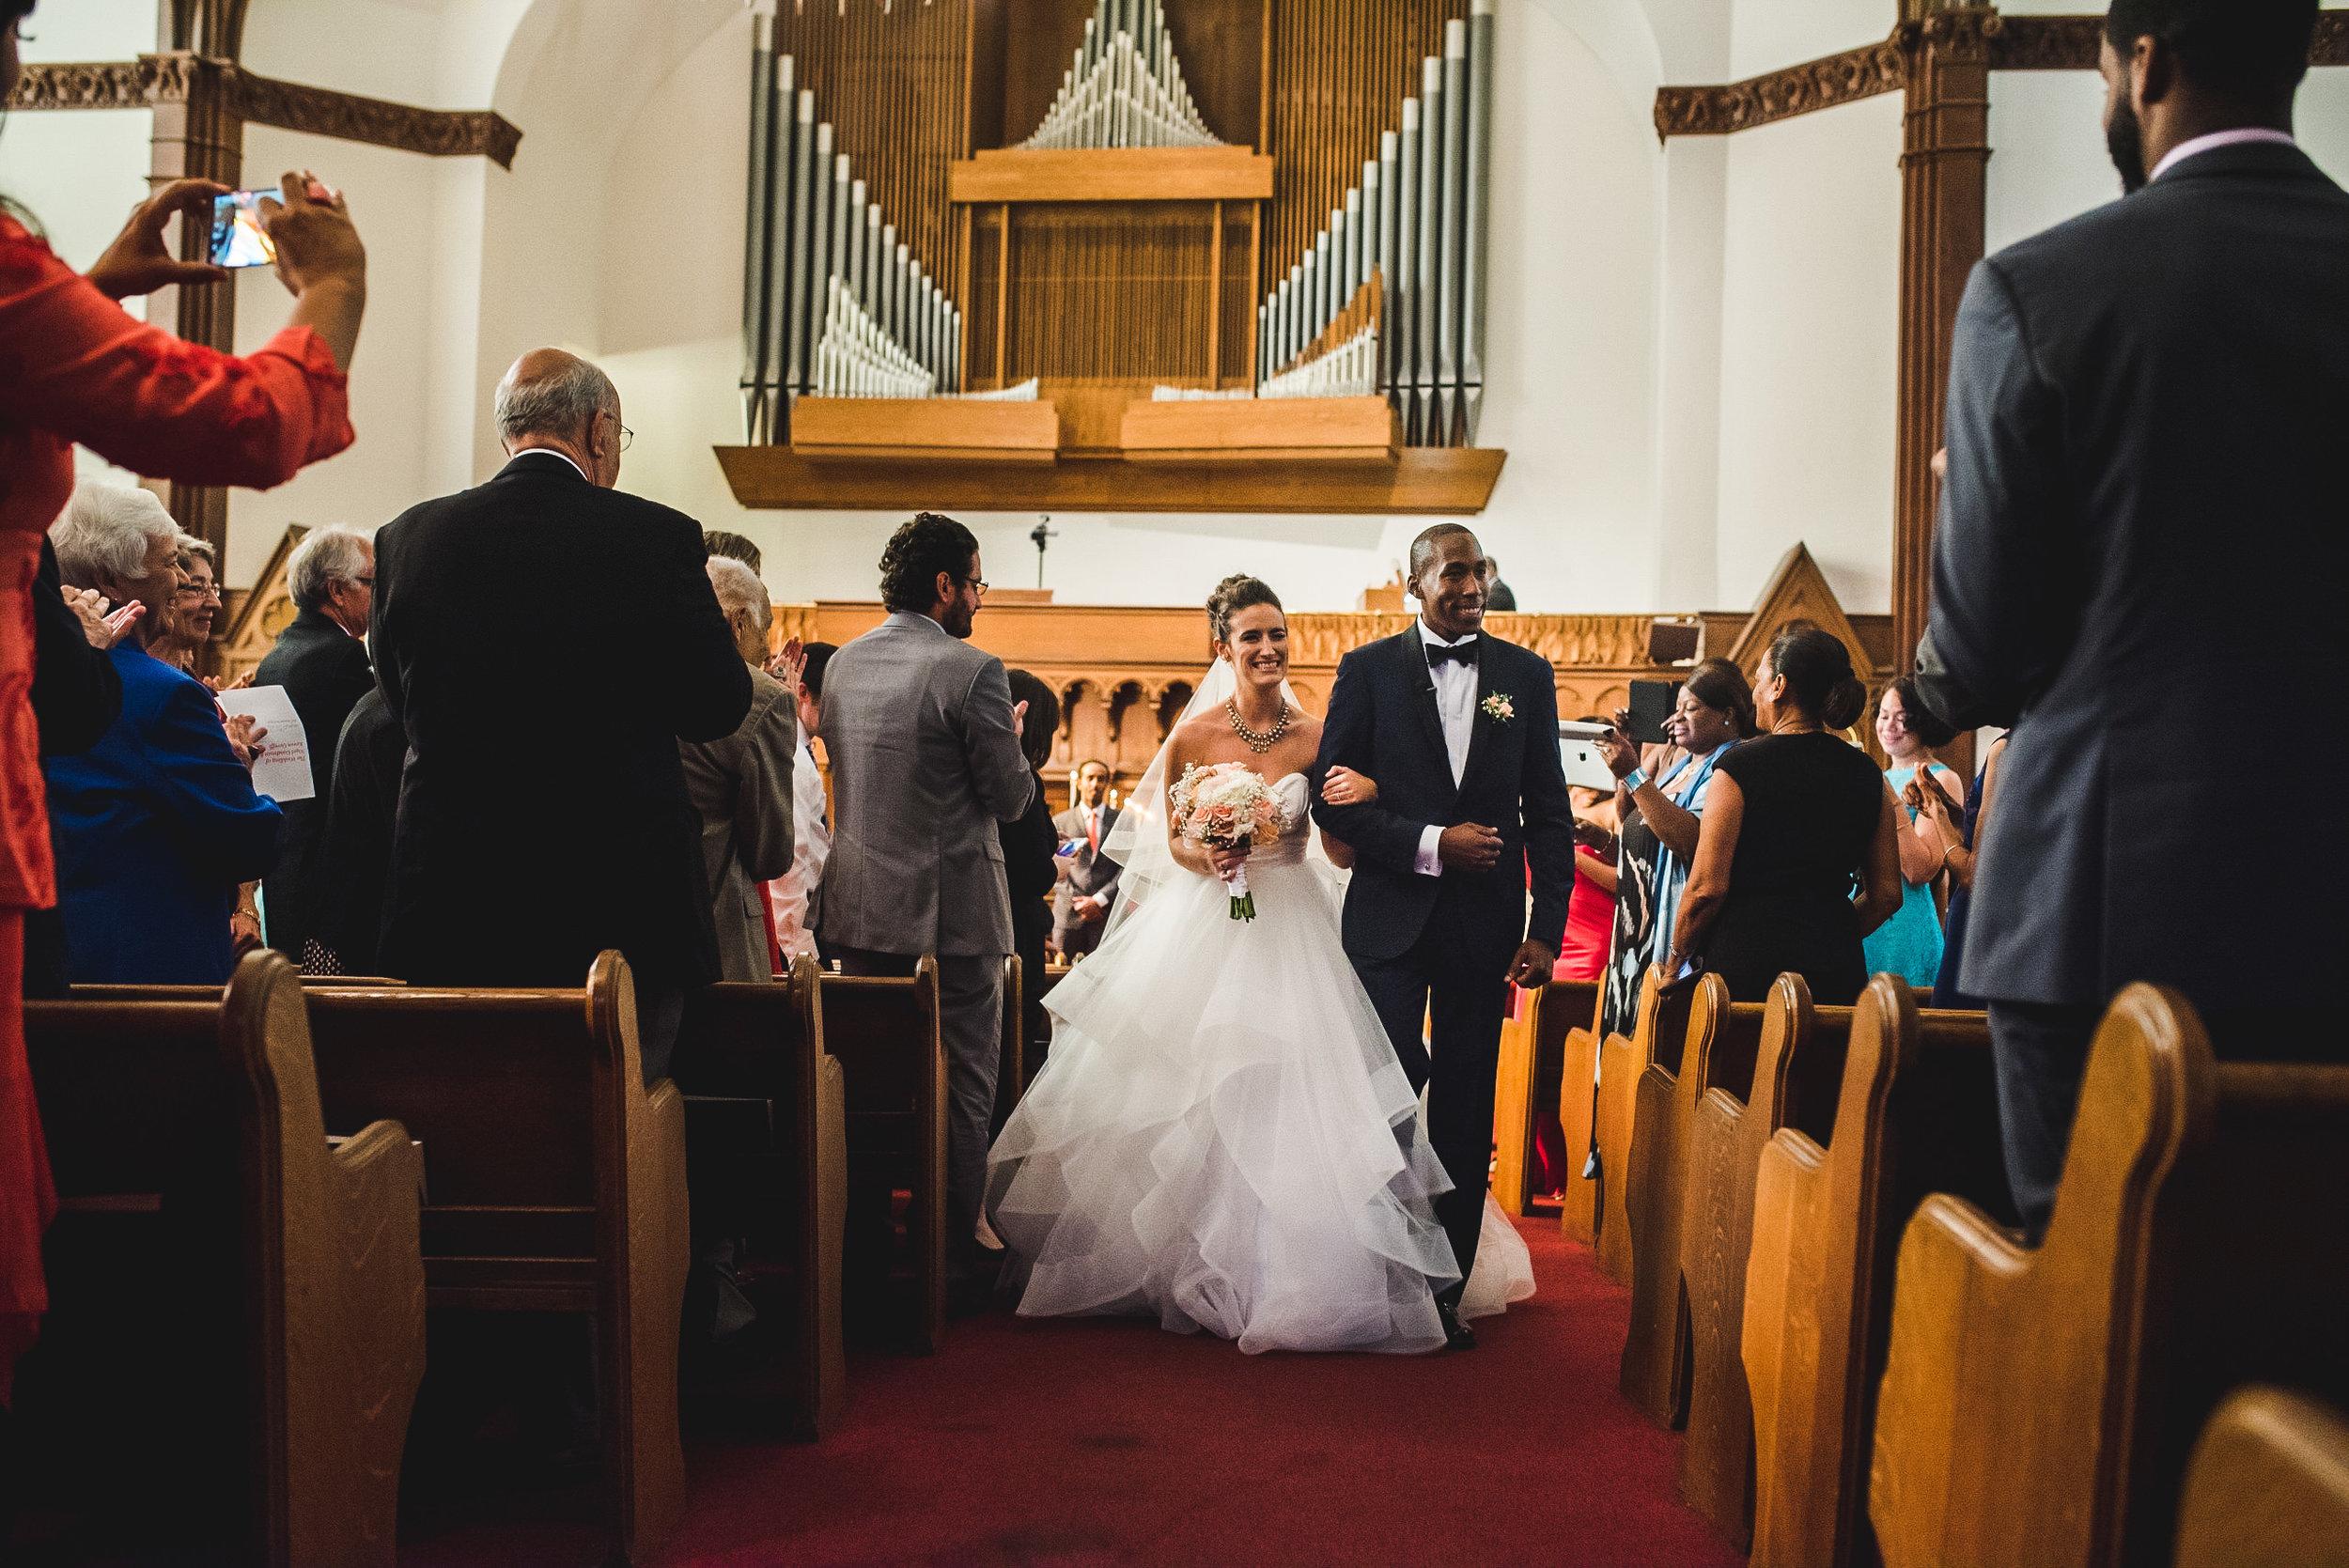 21c Museum Hotel Durham North Carolina Wedding-48.jpg